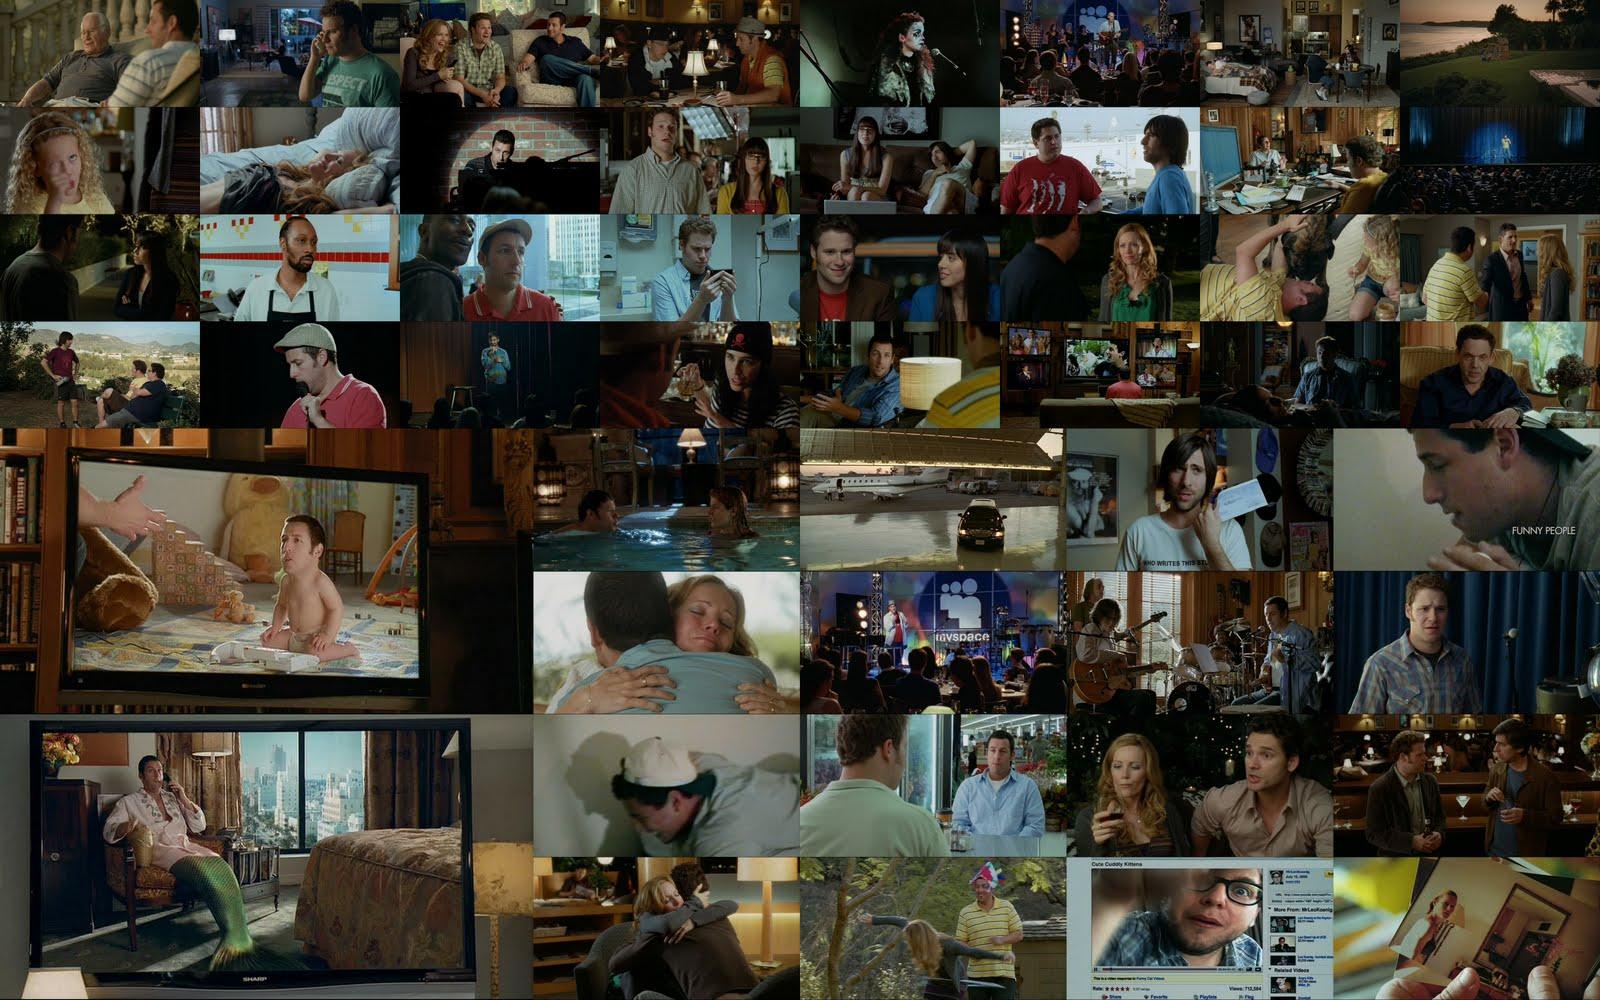 http://1.bp.blogspot.com/_CtW041YFMwI/TI6KctSqb2I/AAAAAAAAAoc/iwHUrpKFmIc/s1600/Funny+People+2009.jpg